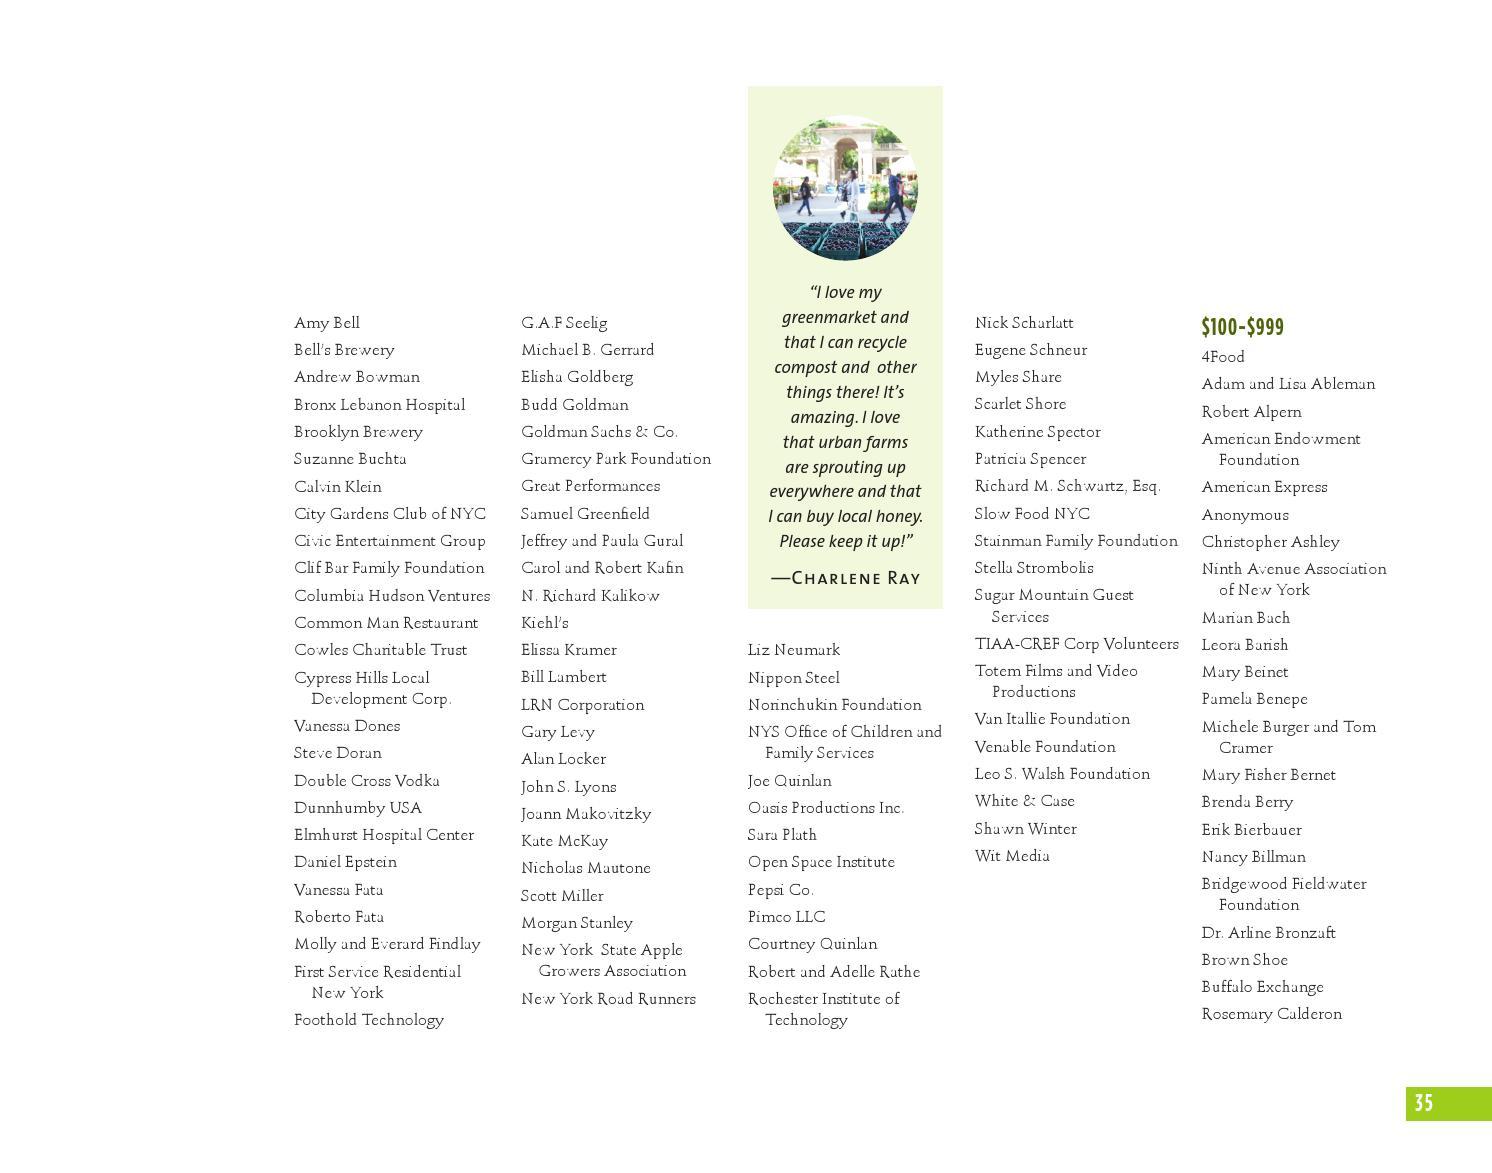 GrowNYC 2014 Annual Report by GrowNYC - issuu